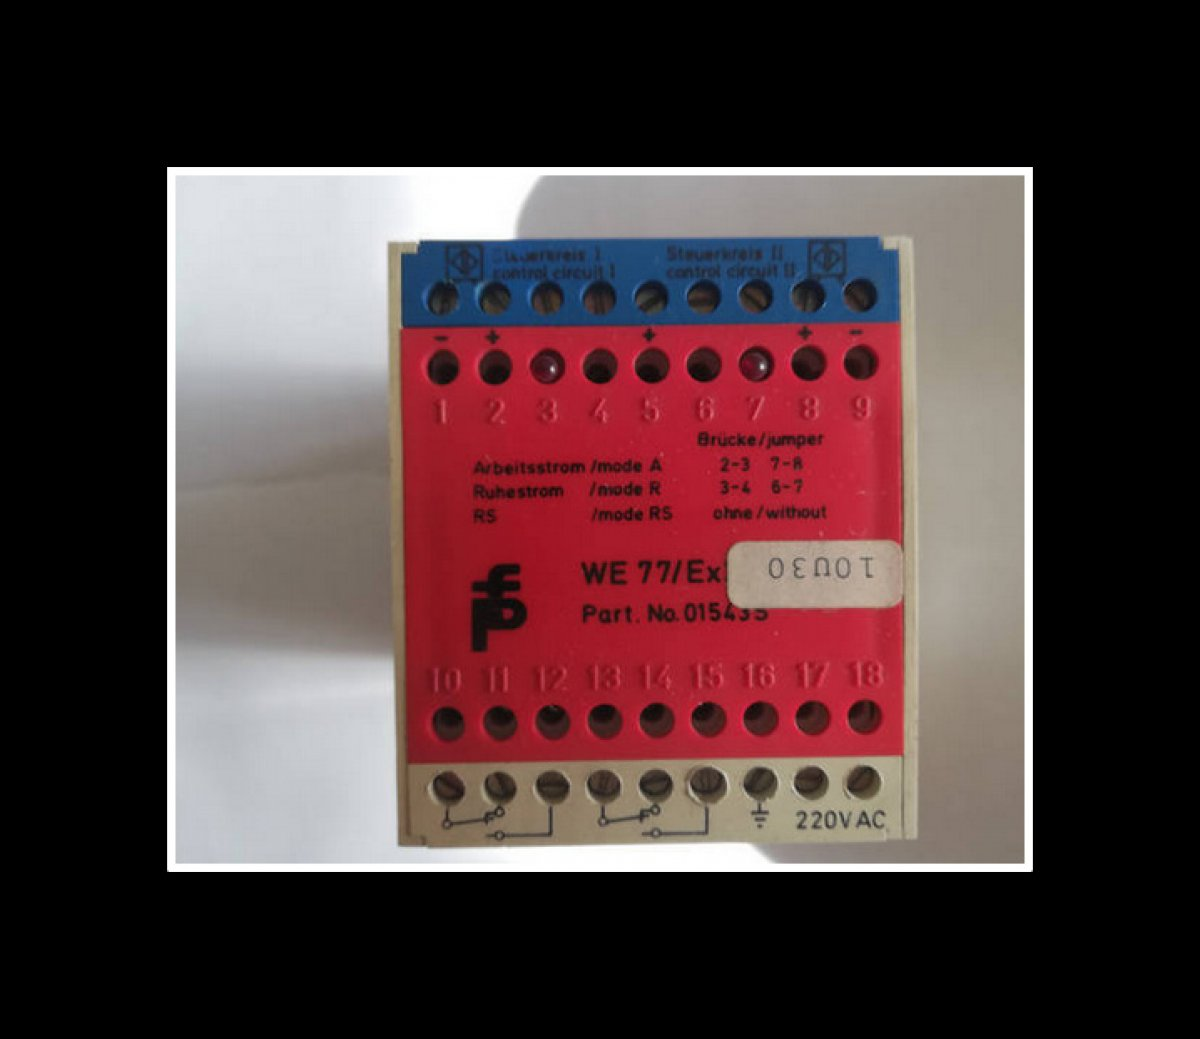 Pepperl+Fuchs WE 77/EX-2